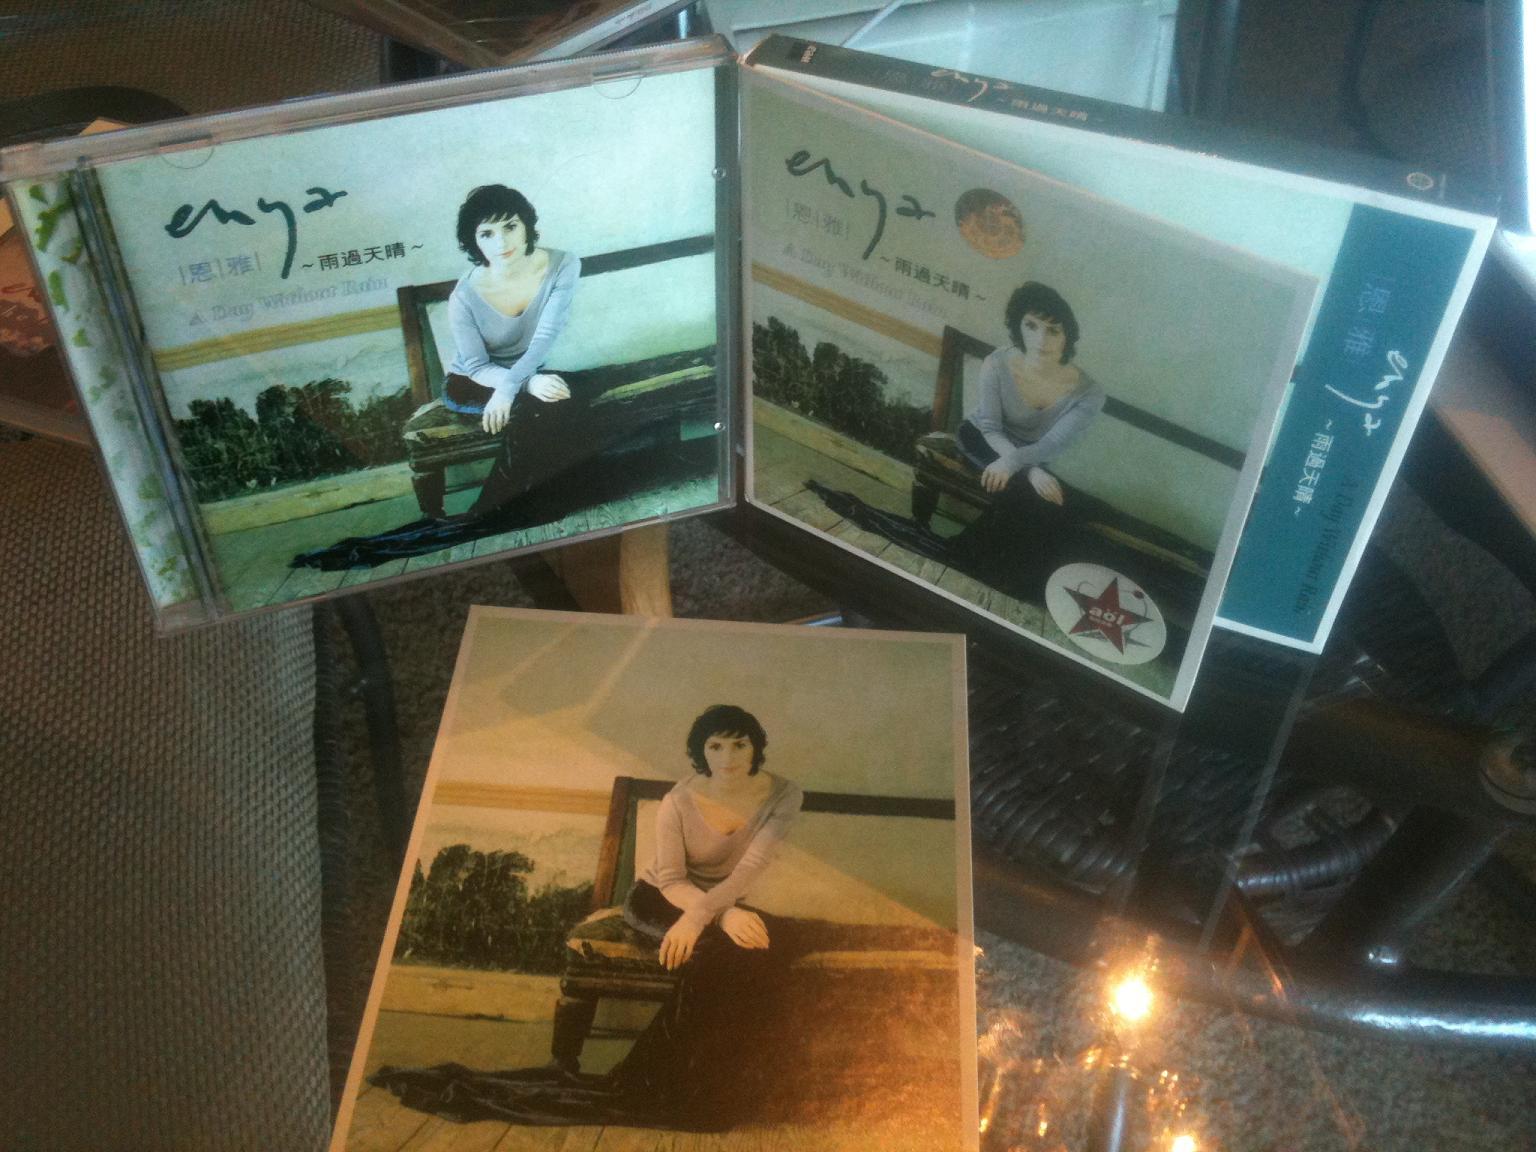 Enya CDs 203.JPG